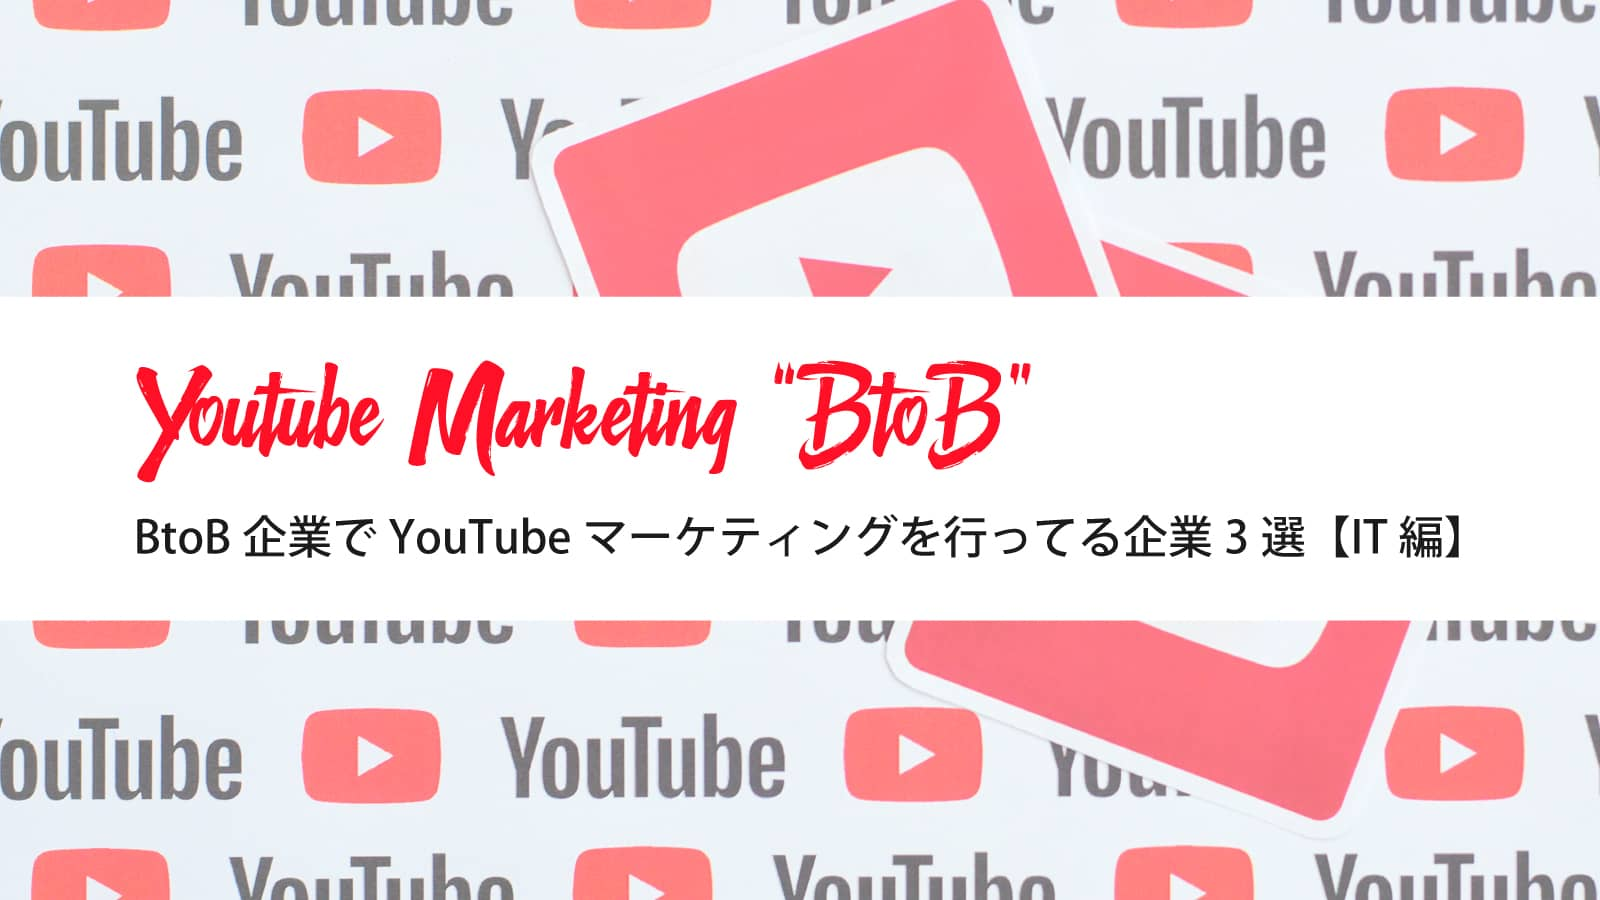 BtoB企業でYouTubeマーケティングを行ってる企業3選【IT編】